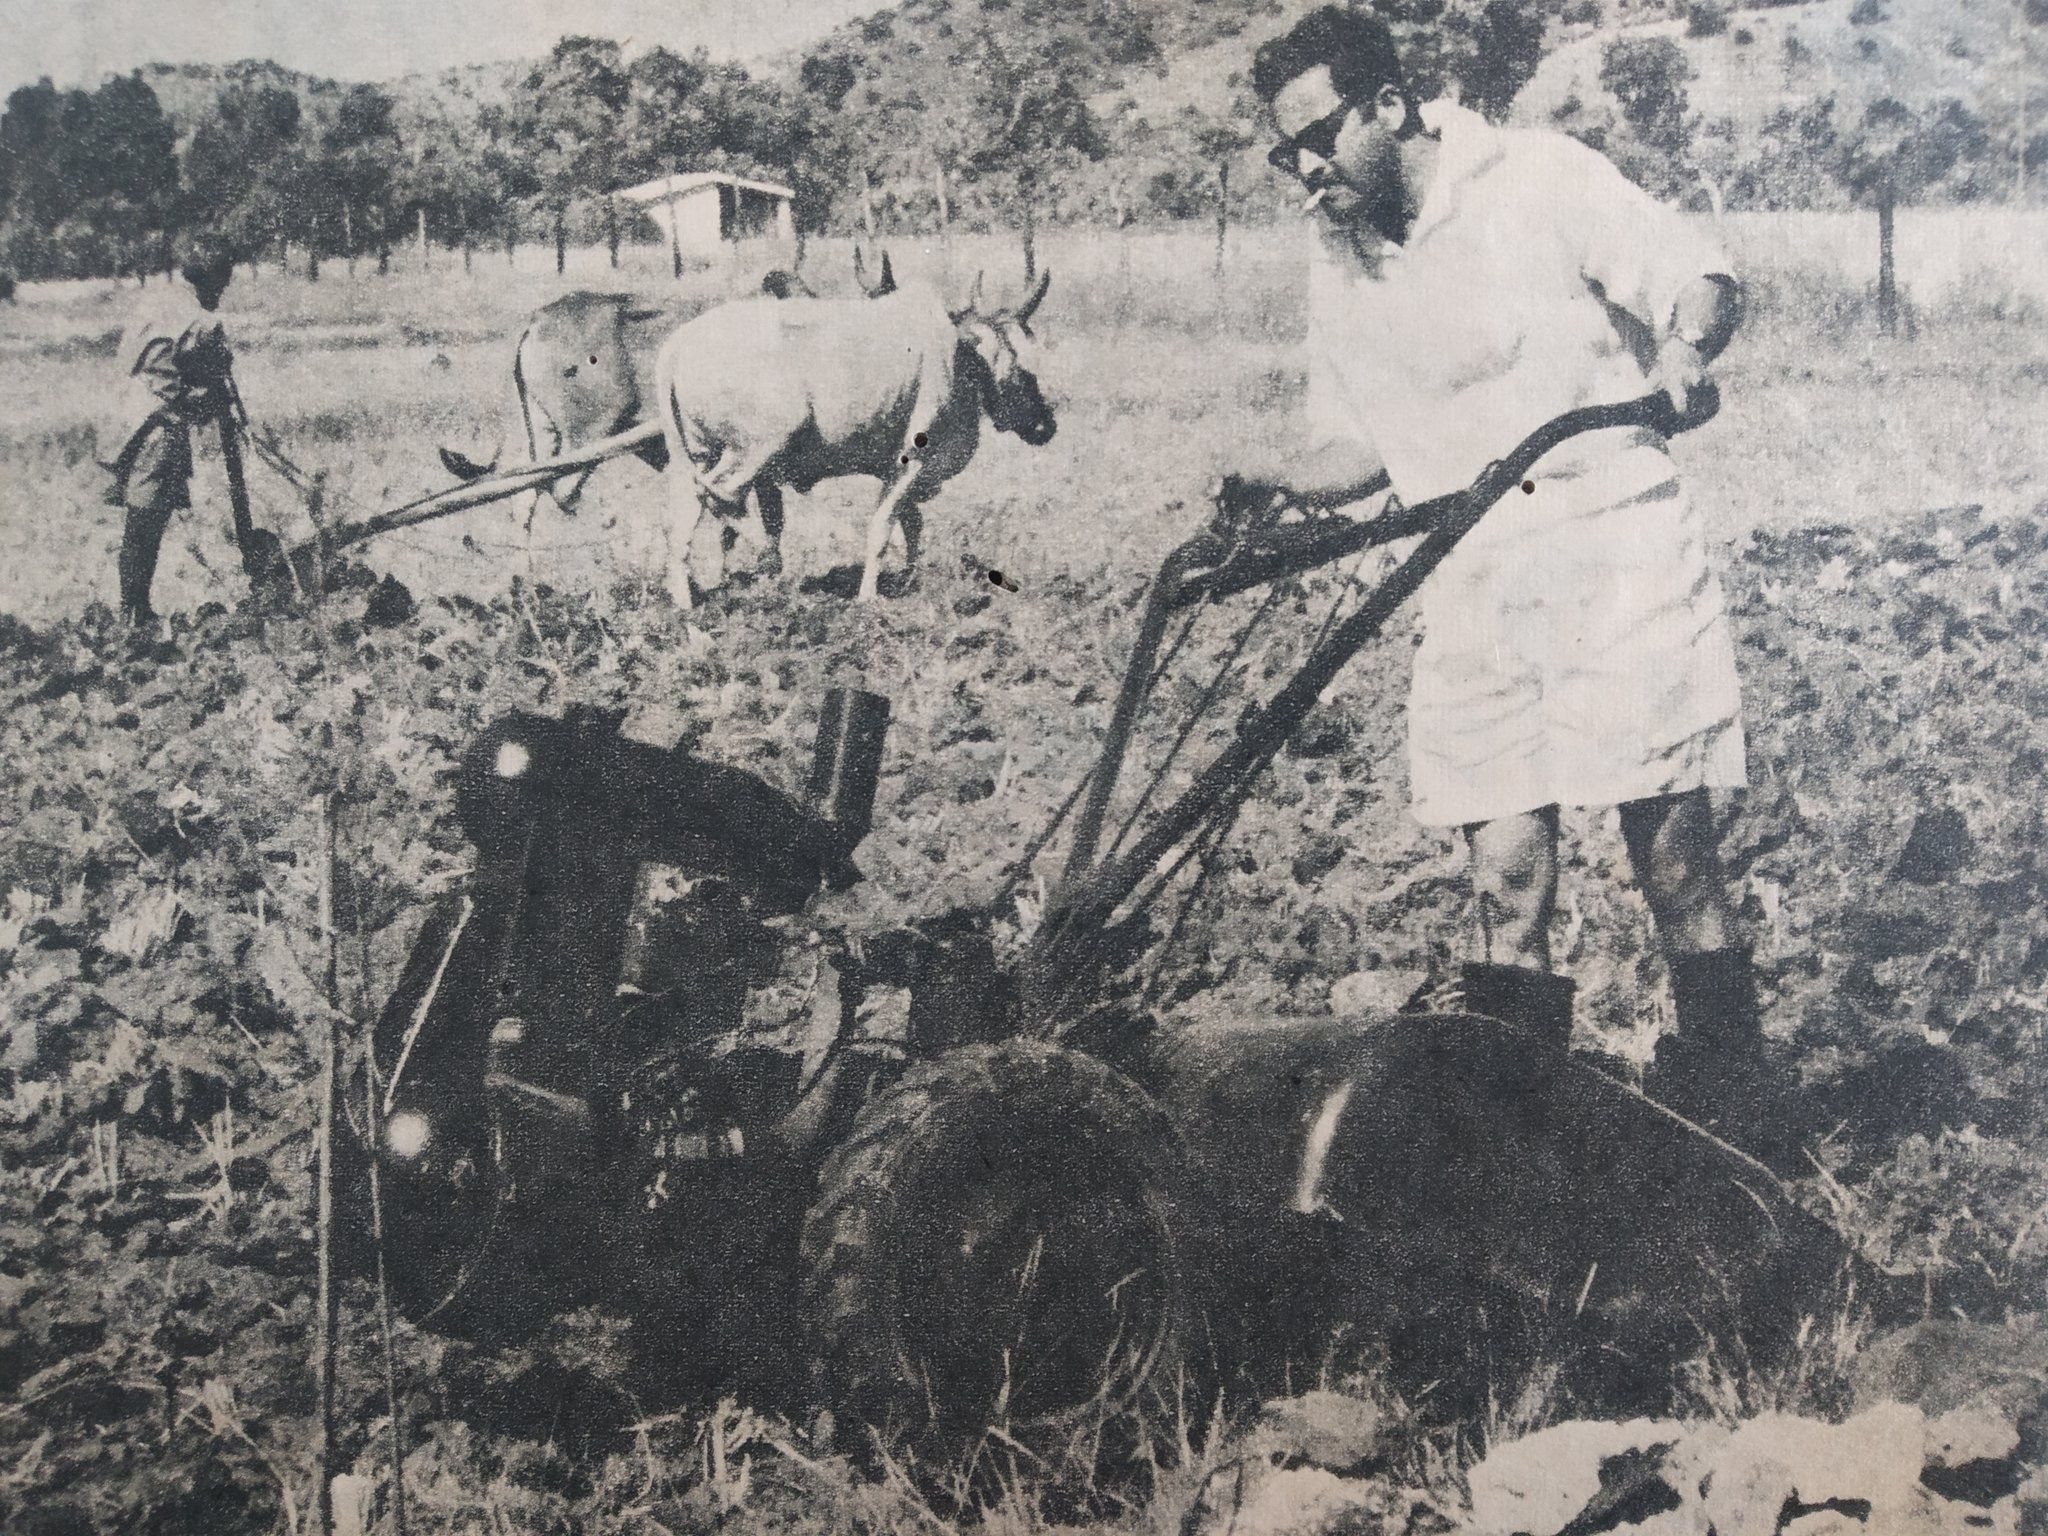 GuruDutt ploughing the fields at his farm in lonavala